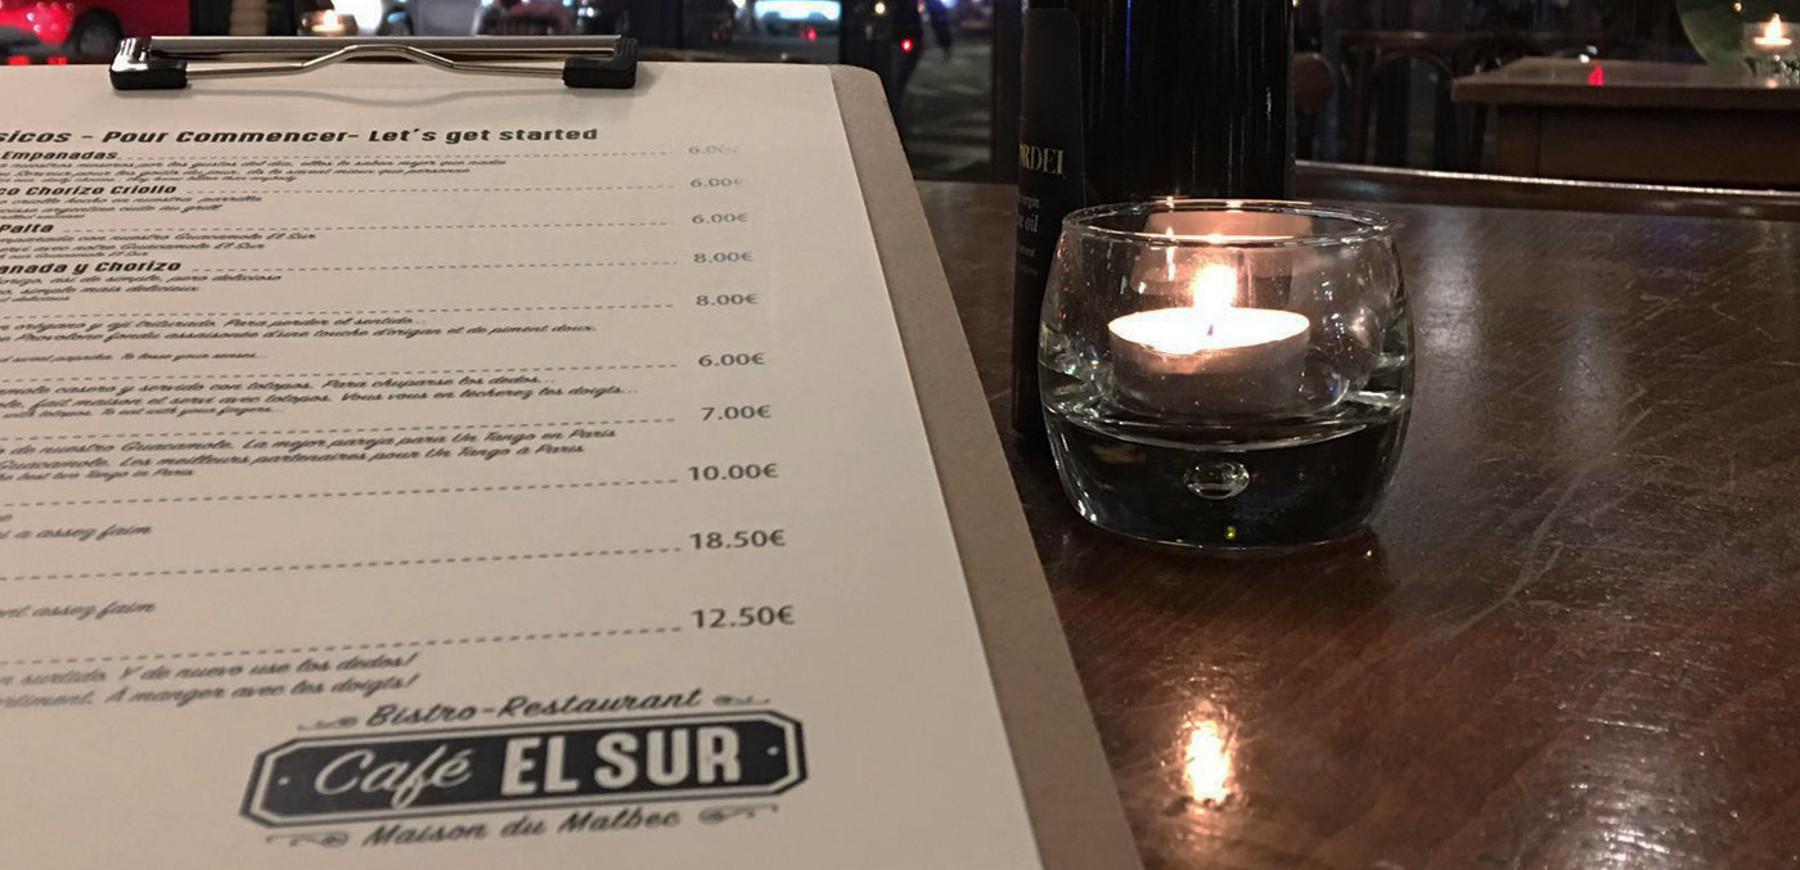 Restaurant Argentin Cafe El Sur